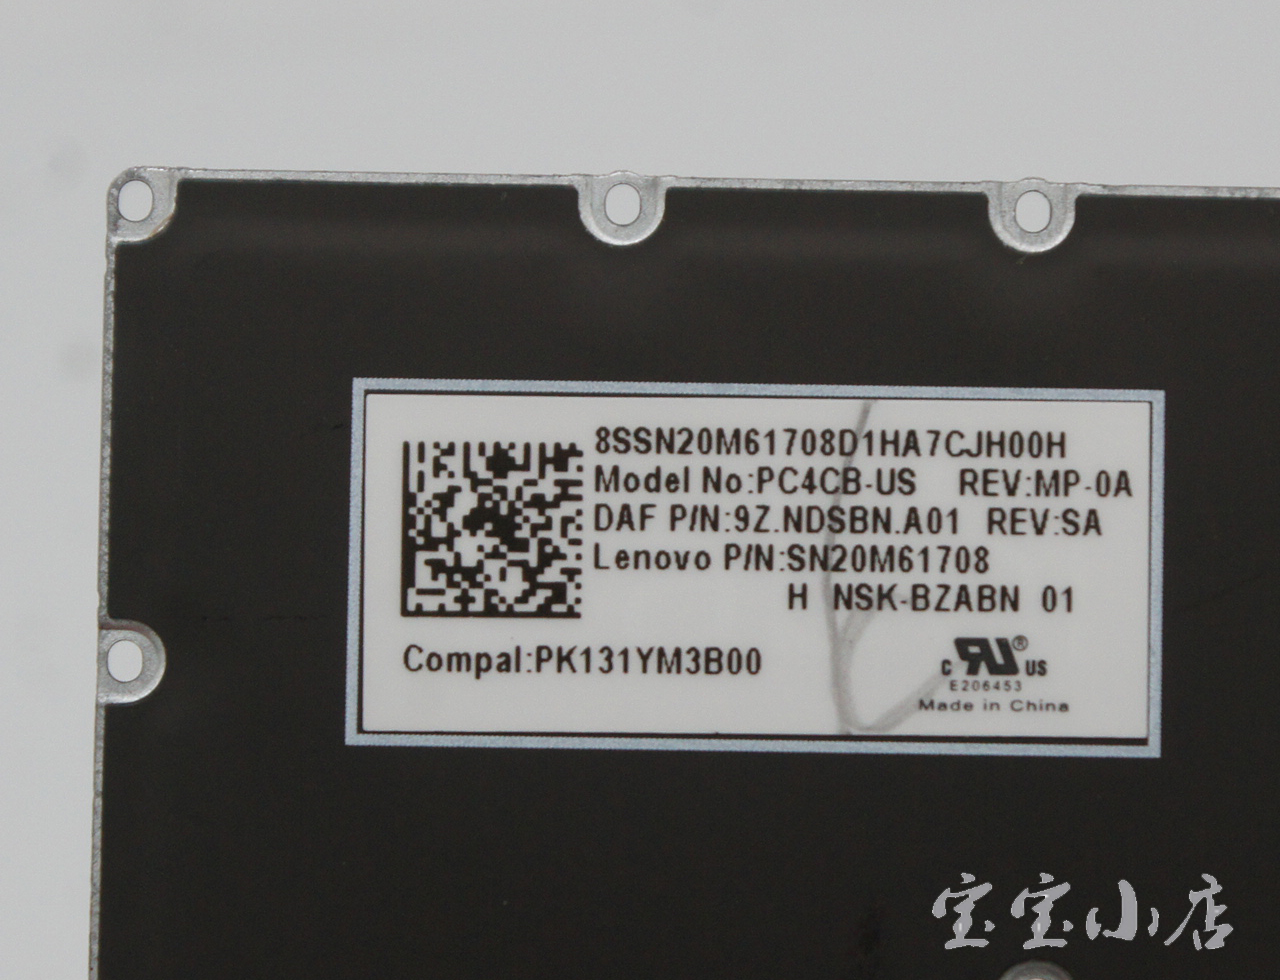 新到货26片 9Z.NDSLN.B01 9Z.NDSBN.A01 PC4CB-US PK131YM3B00 NSK-BZABN backlit keyboard 联想背光键盘